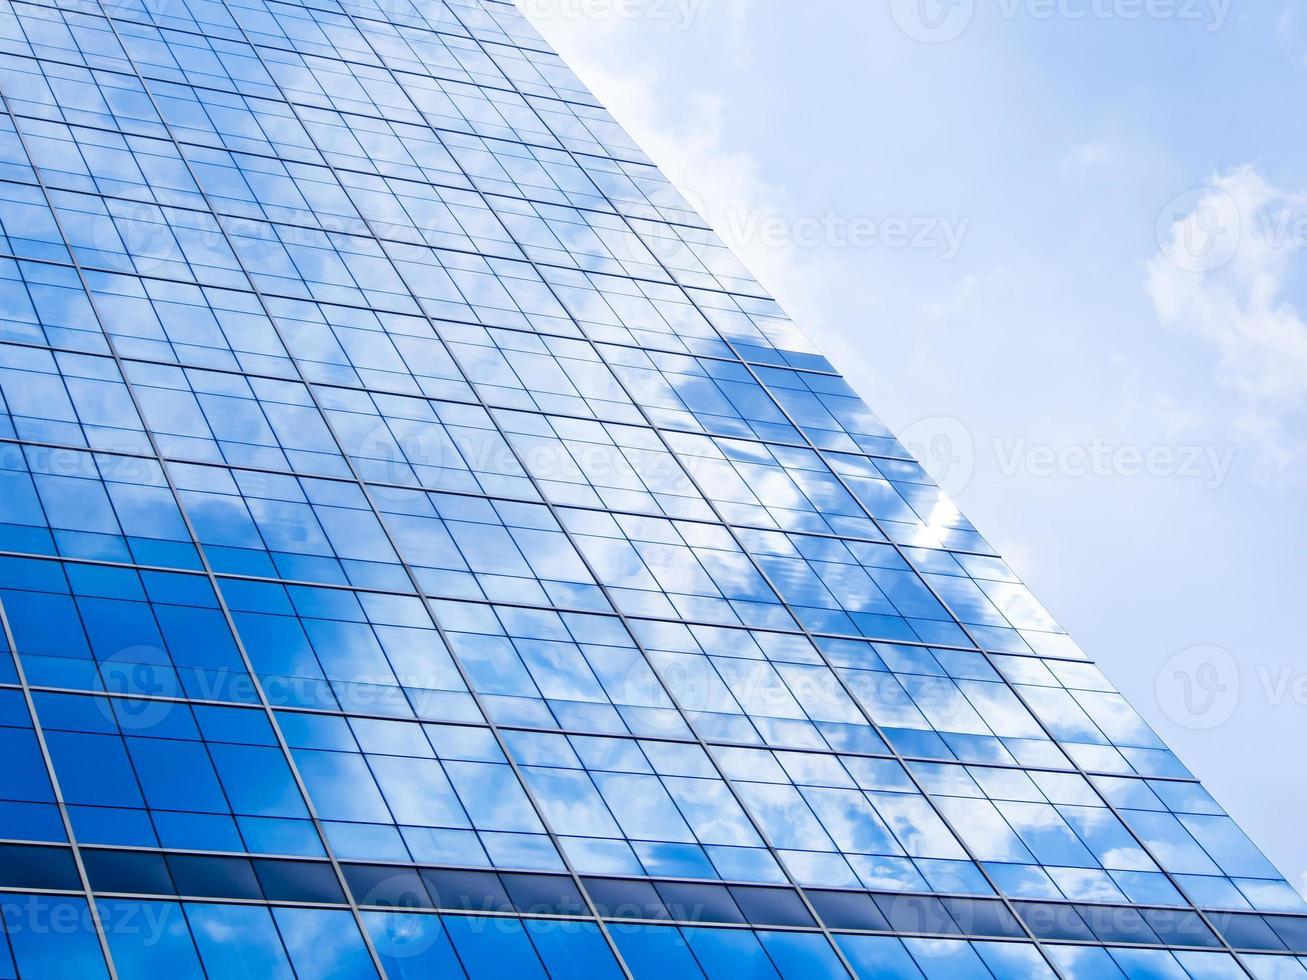 Fondo azul de rascacielos de cristal de gran altura foto